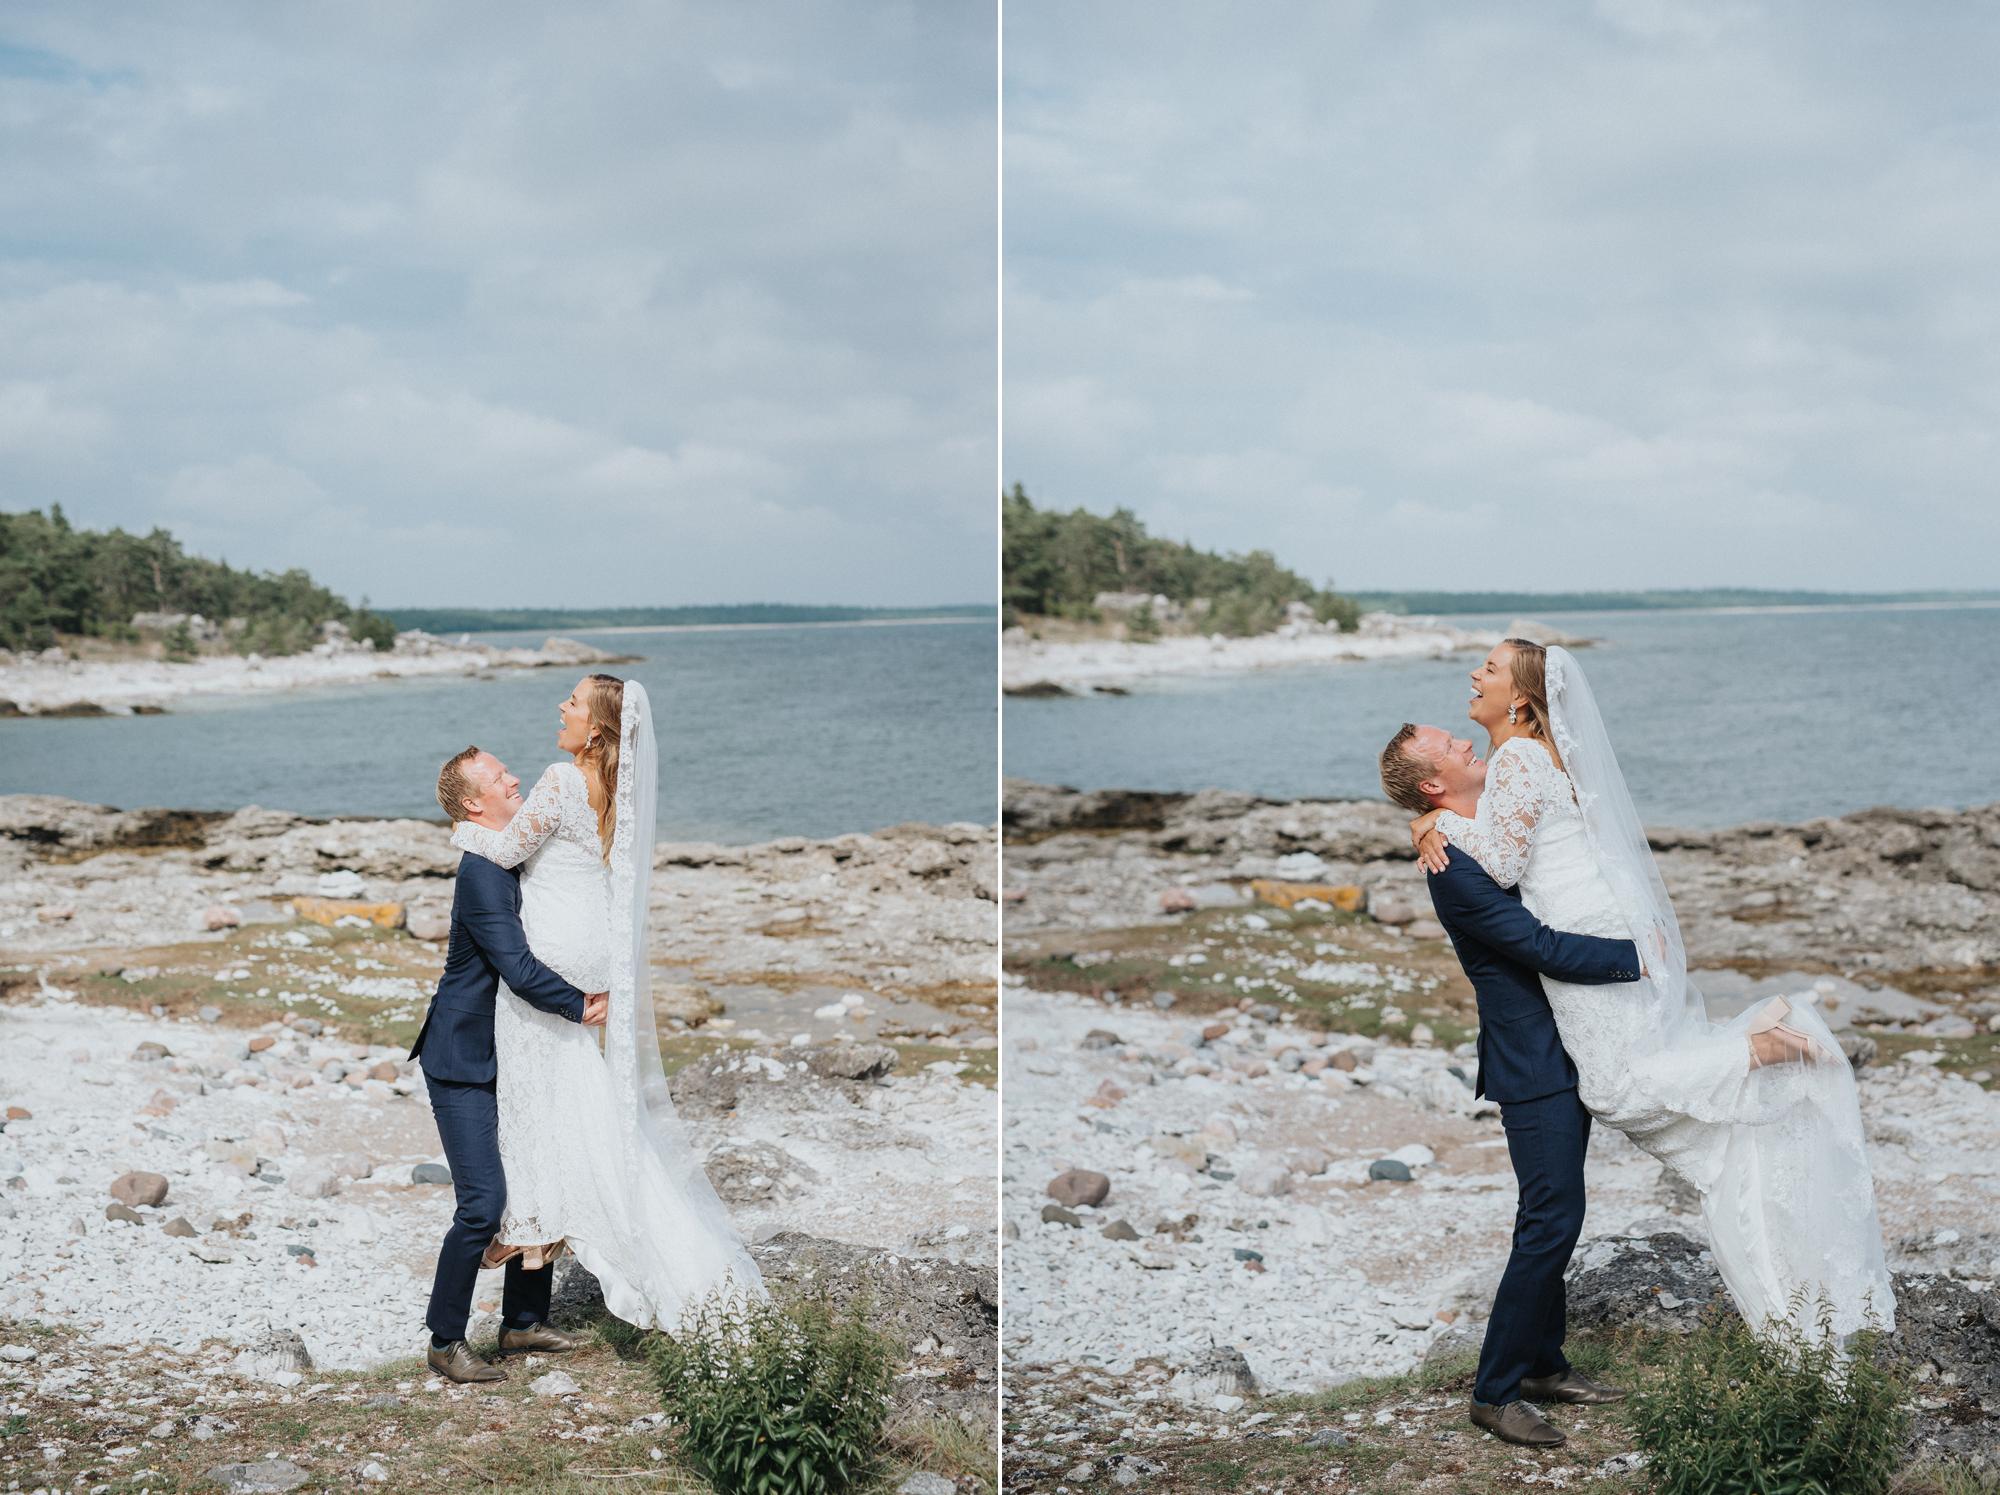 026-bröllopsfotograf-folhammar-gotland-neas-fotografi.jpg